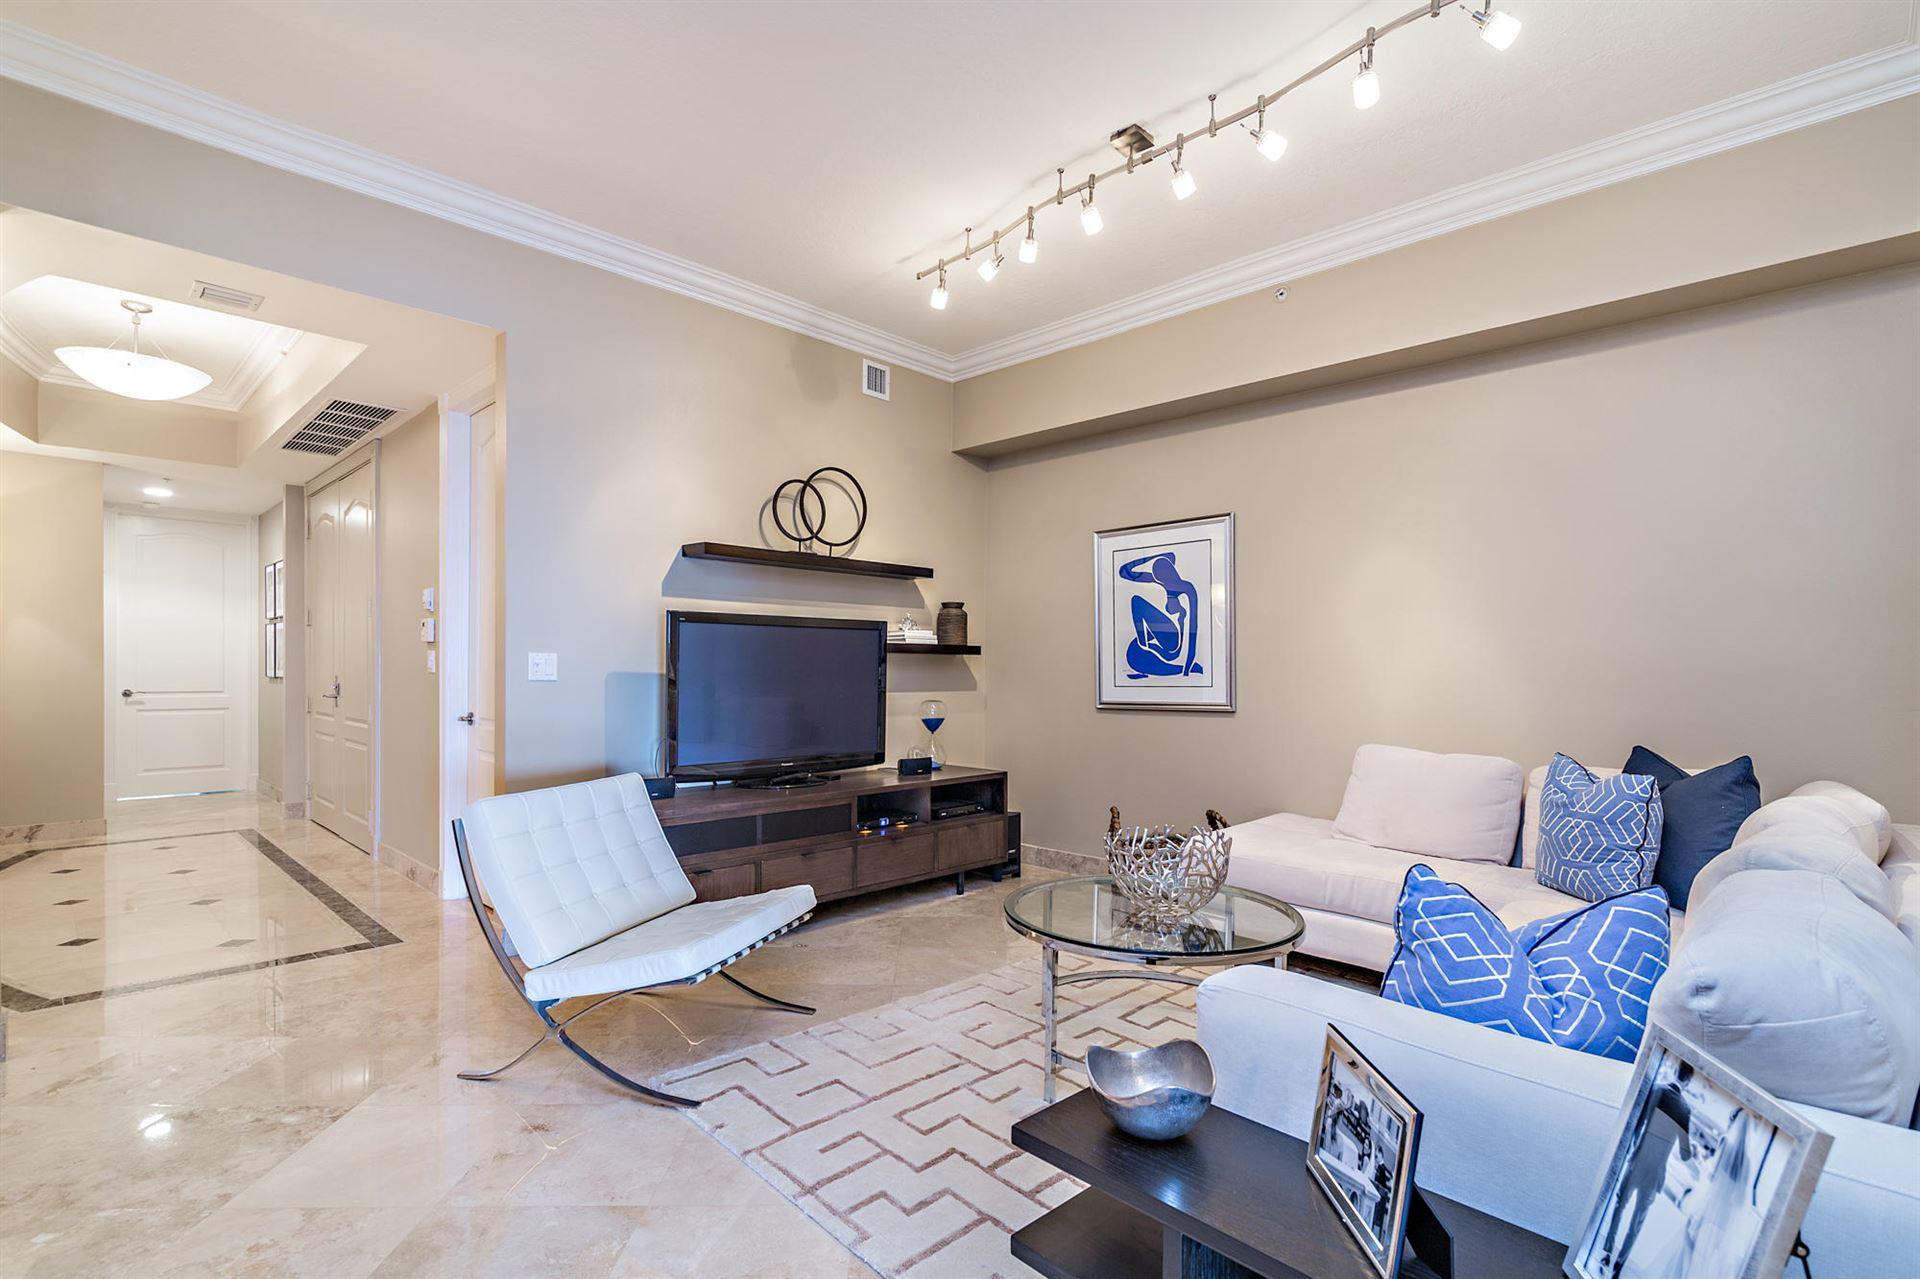 201 S Narcissus Avenue #503, West Palm Beach, FL 33401 - #: RX-10631846